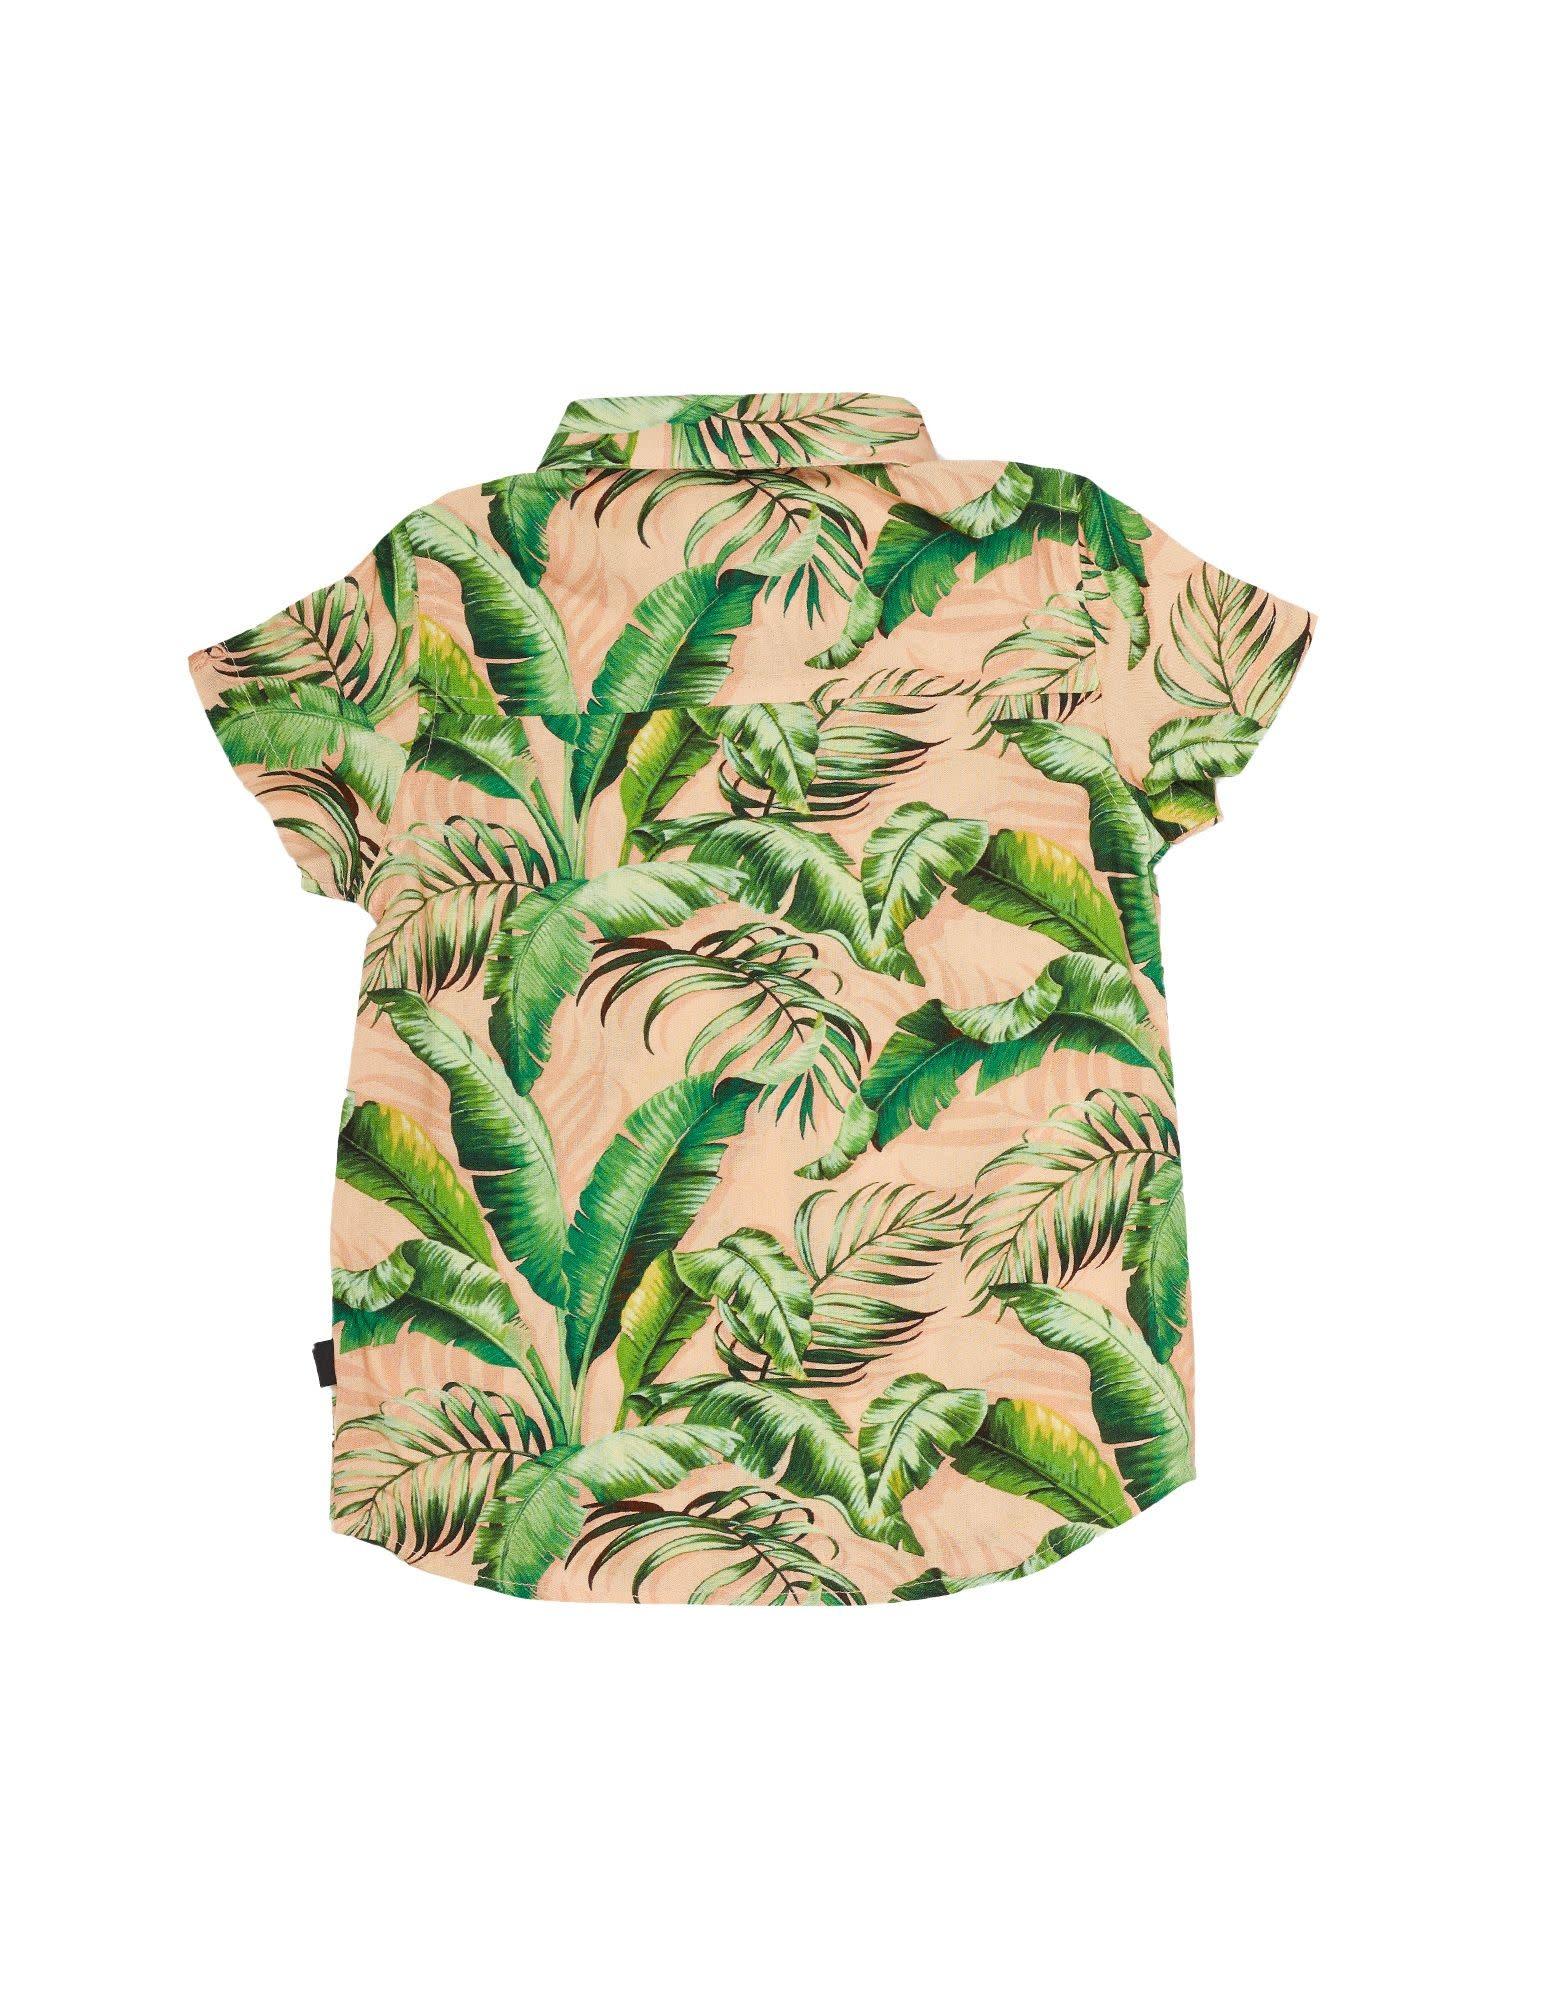 Animal Crackers Sunset SS Shirt